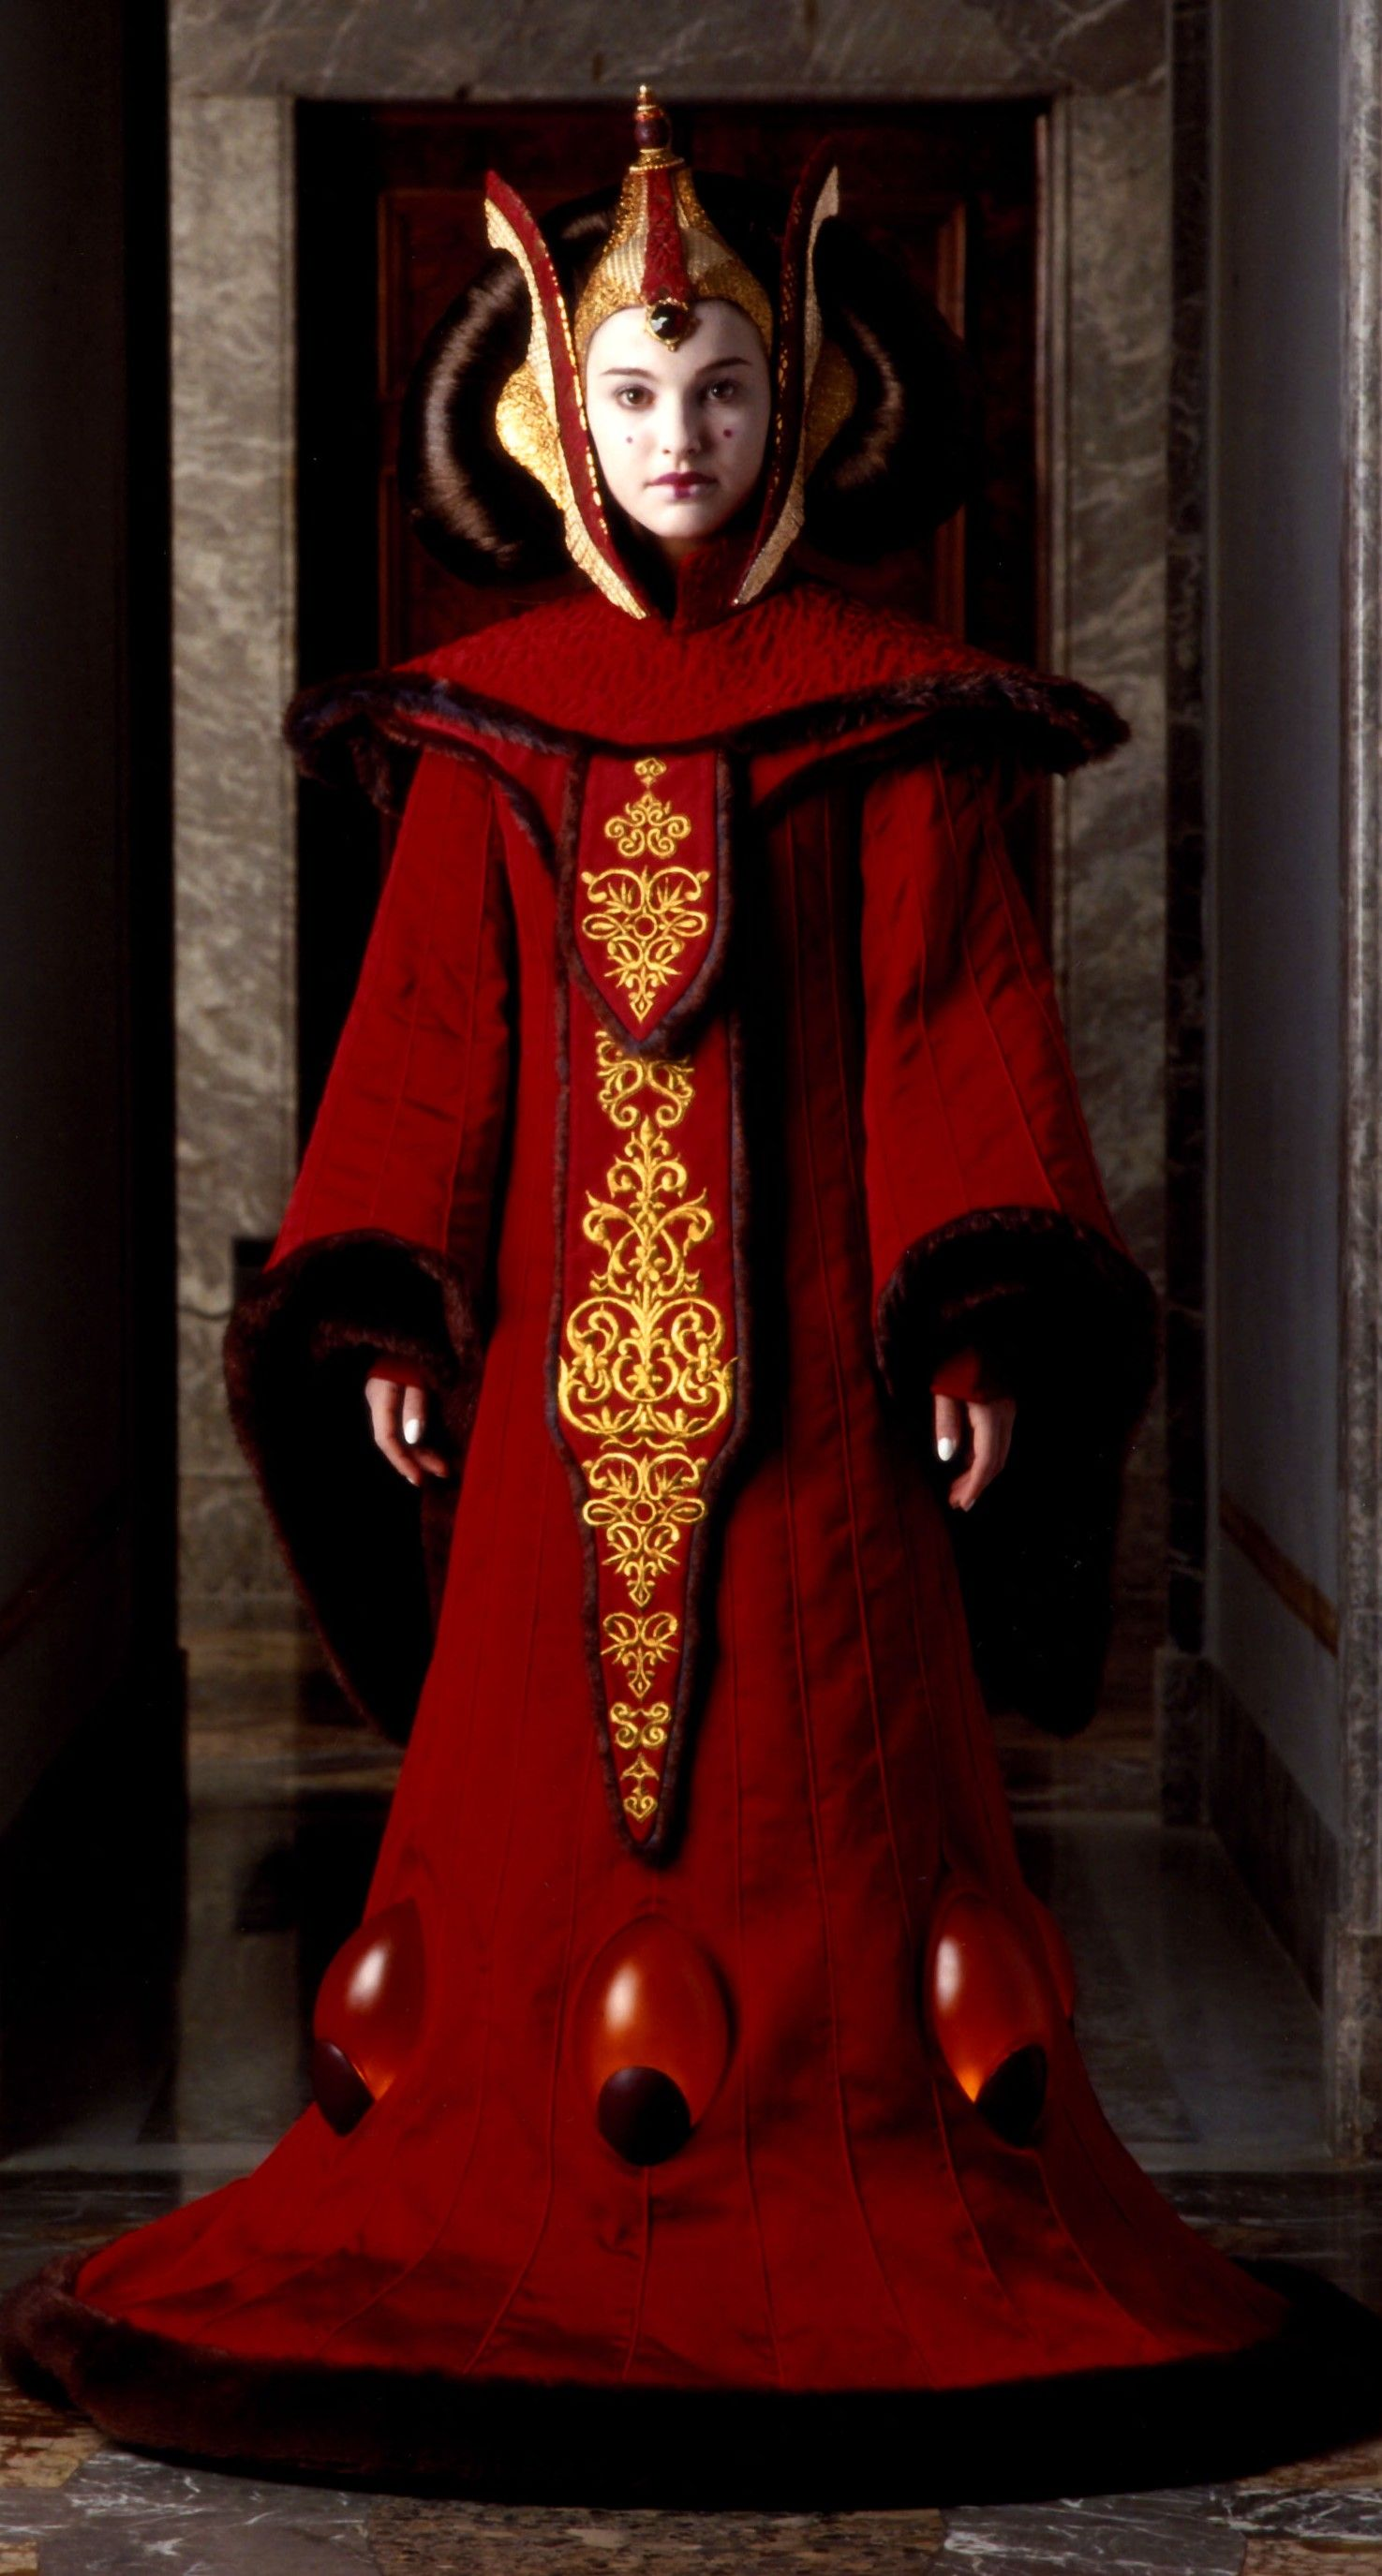 Star Wars The Phantom Menace Padmé Amidala Cosplay Costume Queen Dress